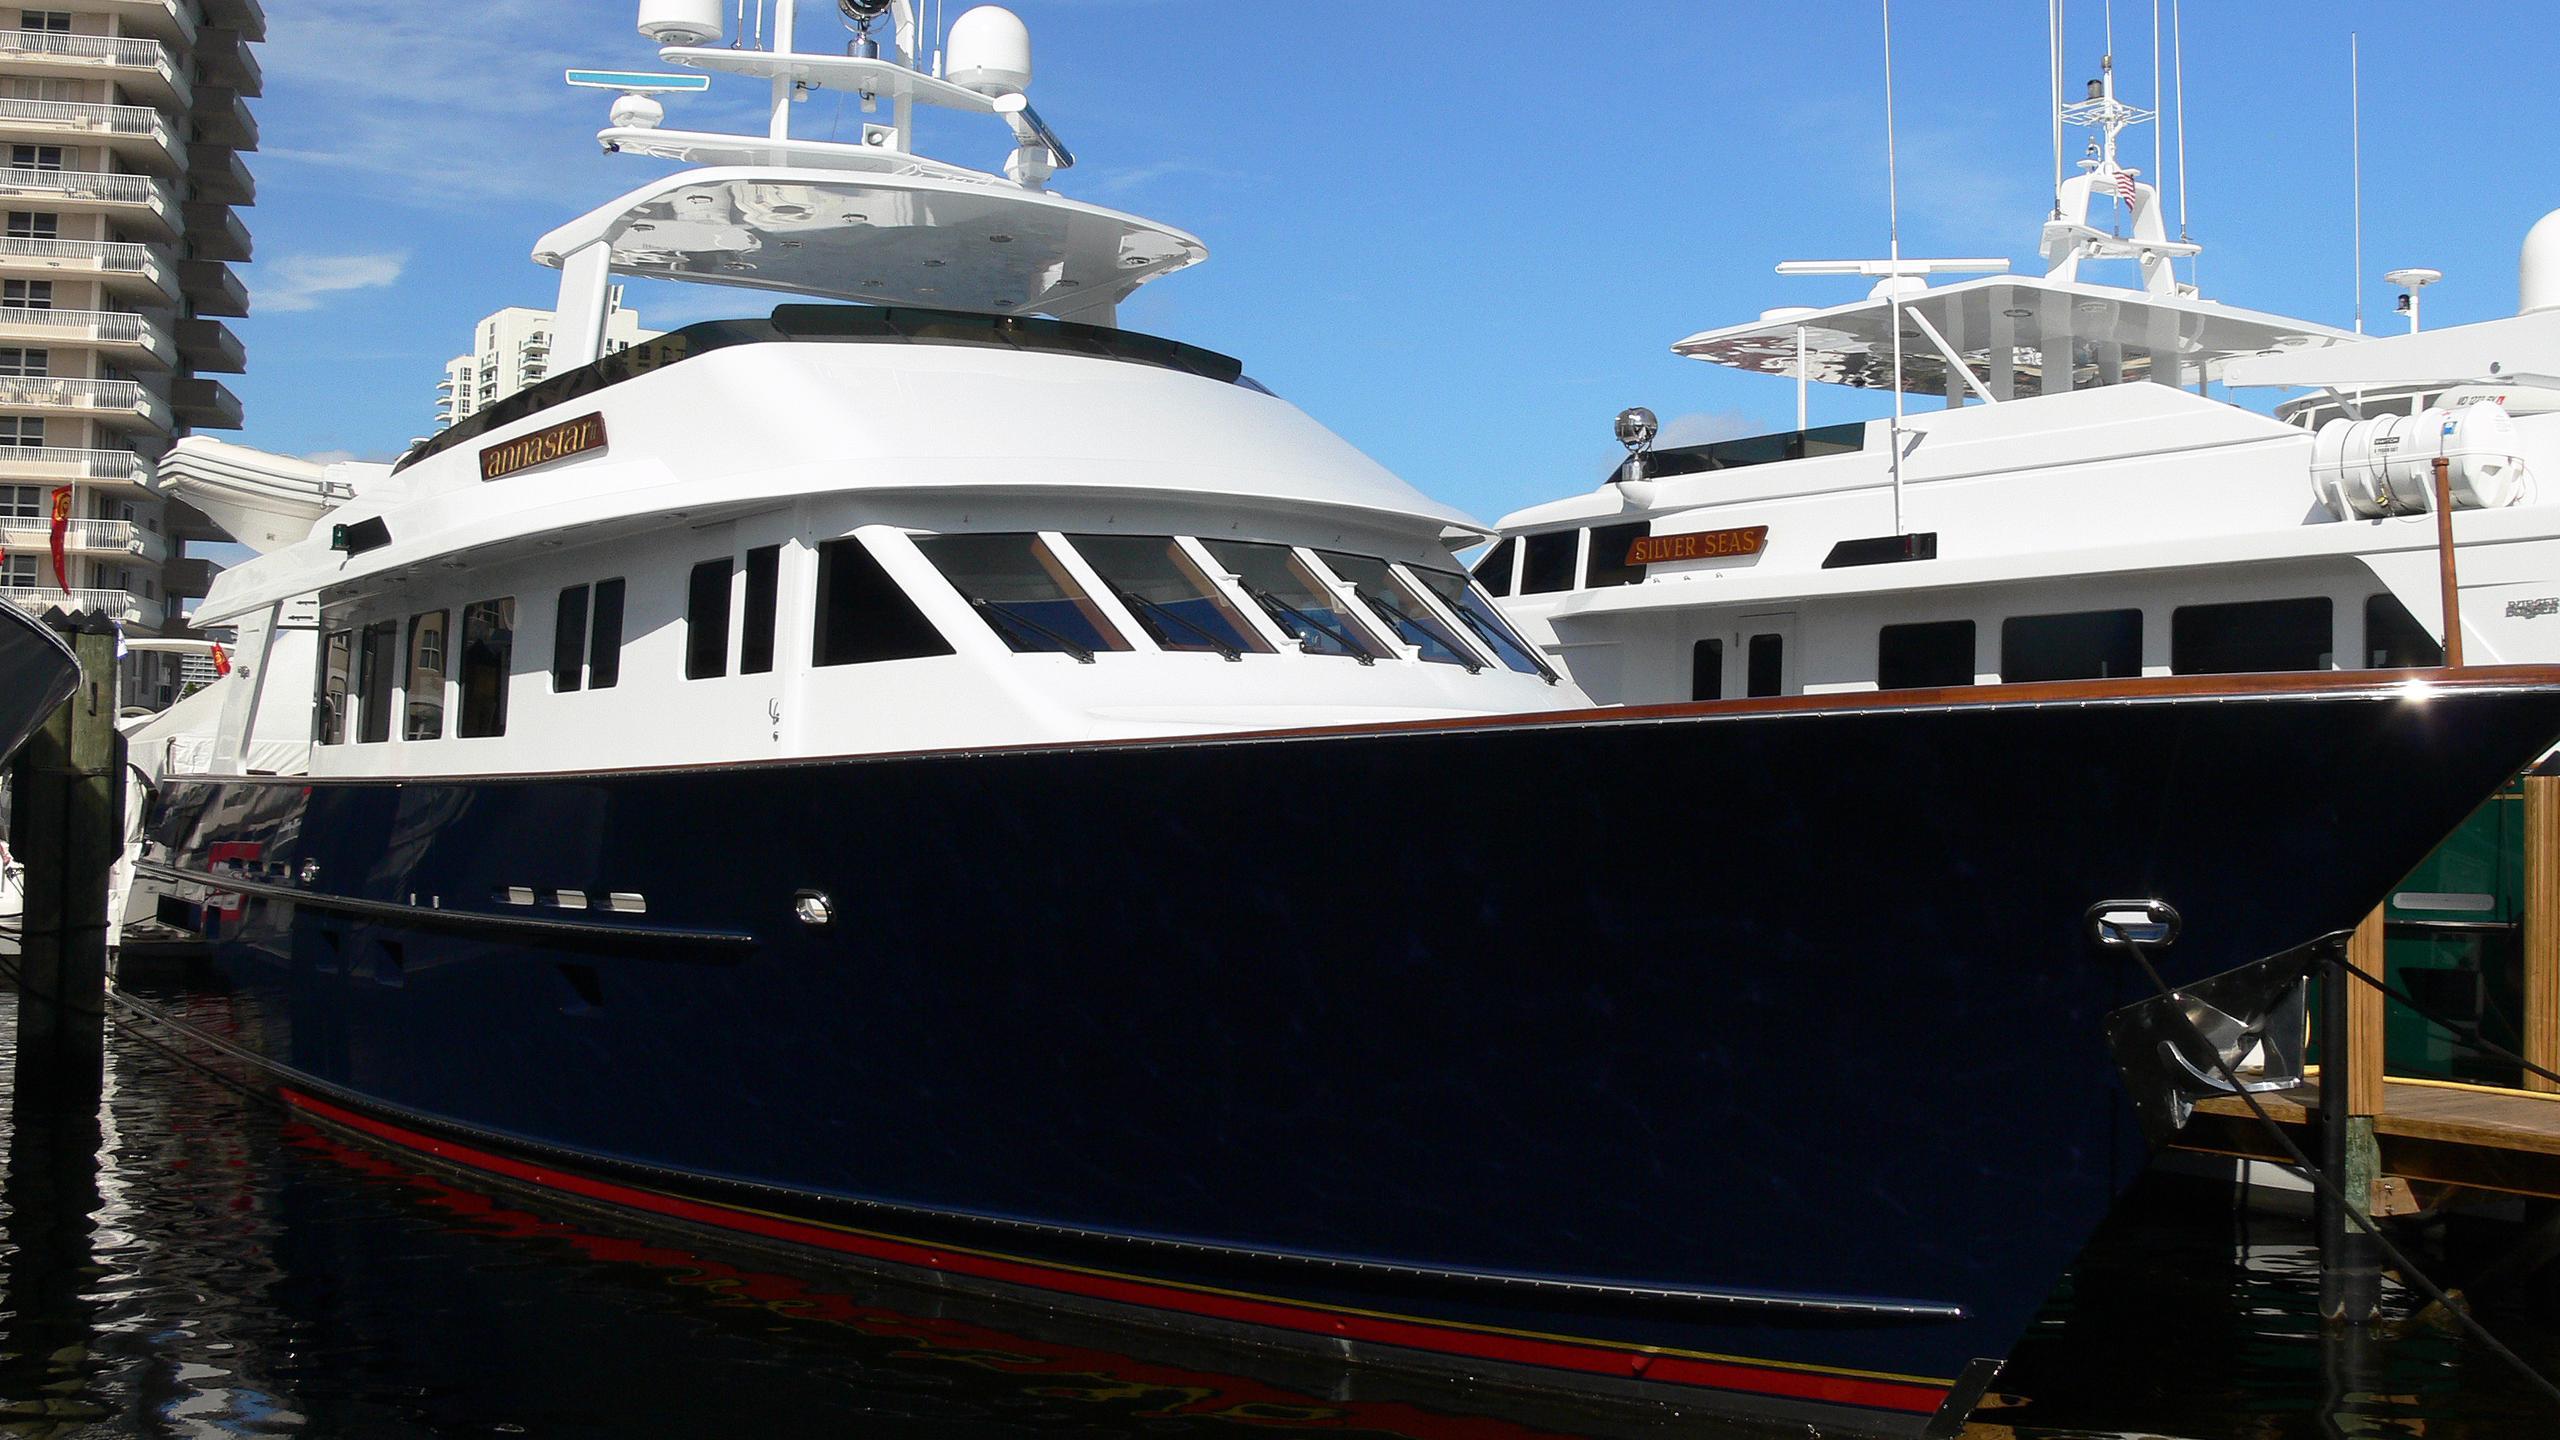 margarita-motor-yacht-burger-2001-26m-half-profile